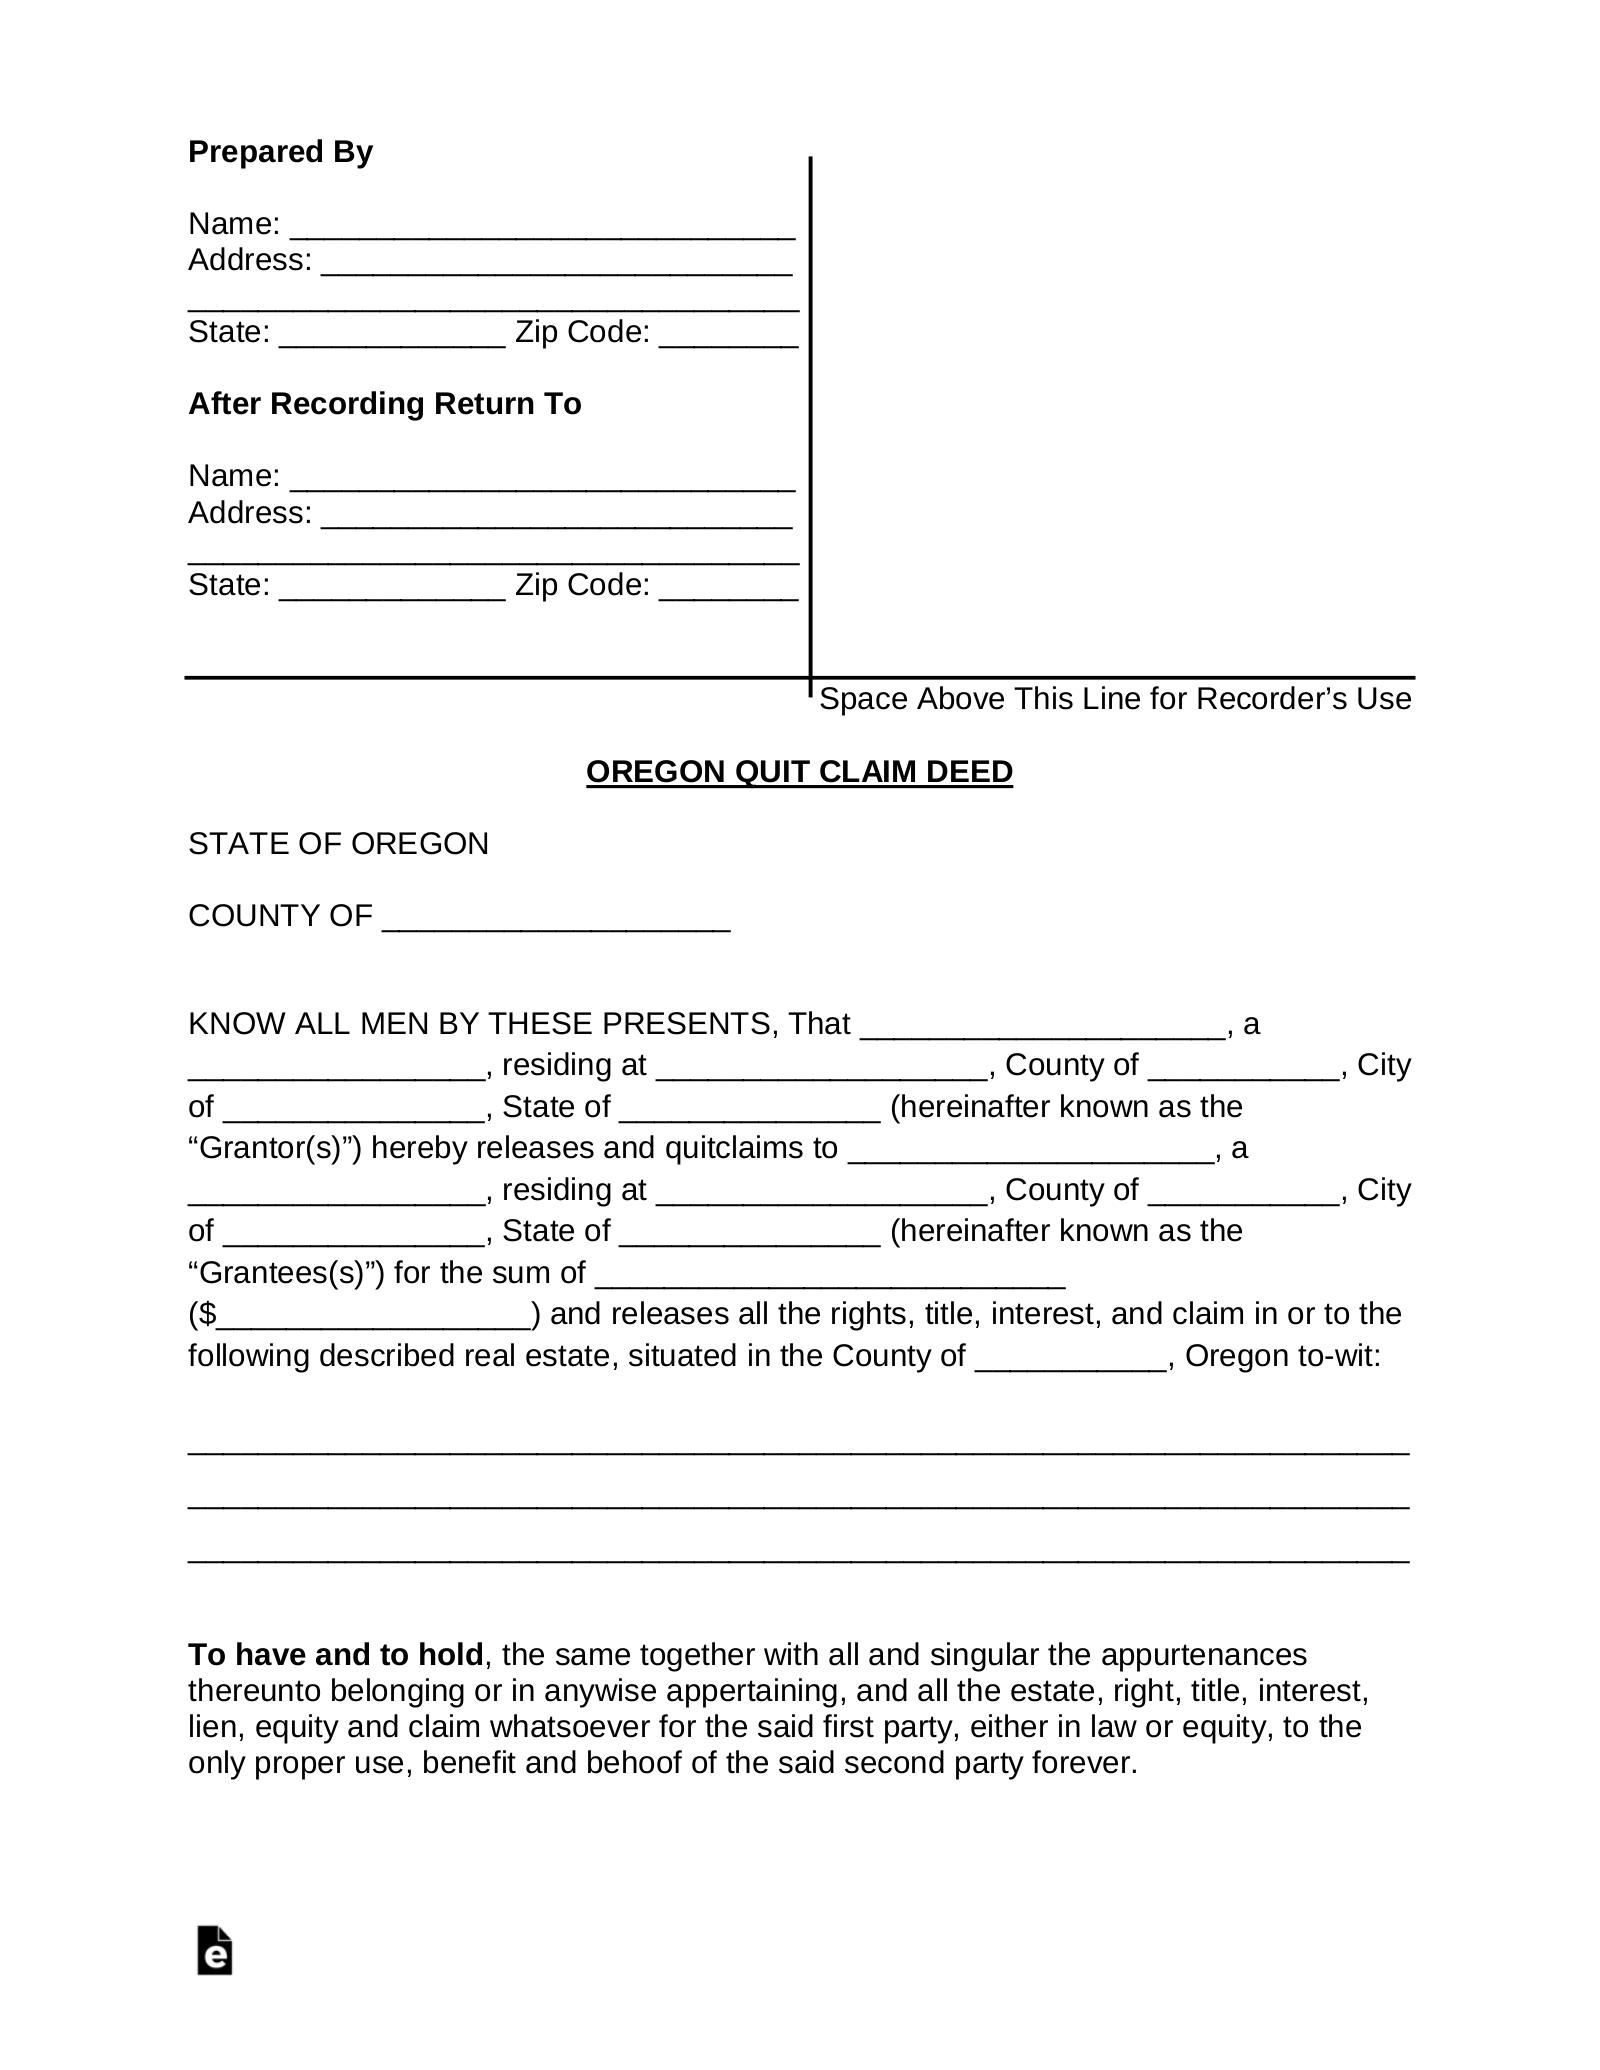 quick claim deed form oregon  Free Oregon Quit Claim Deed Form - Word | PDF | eForms ...